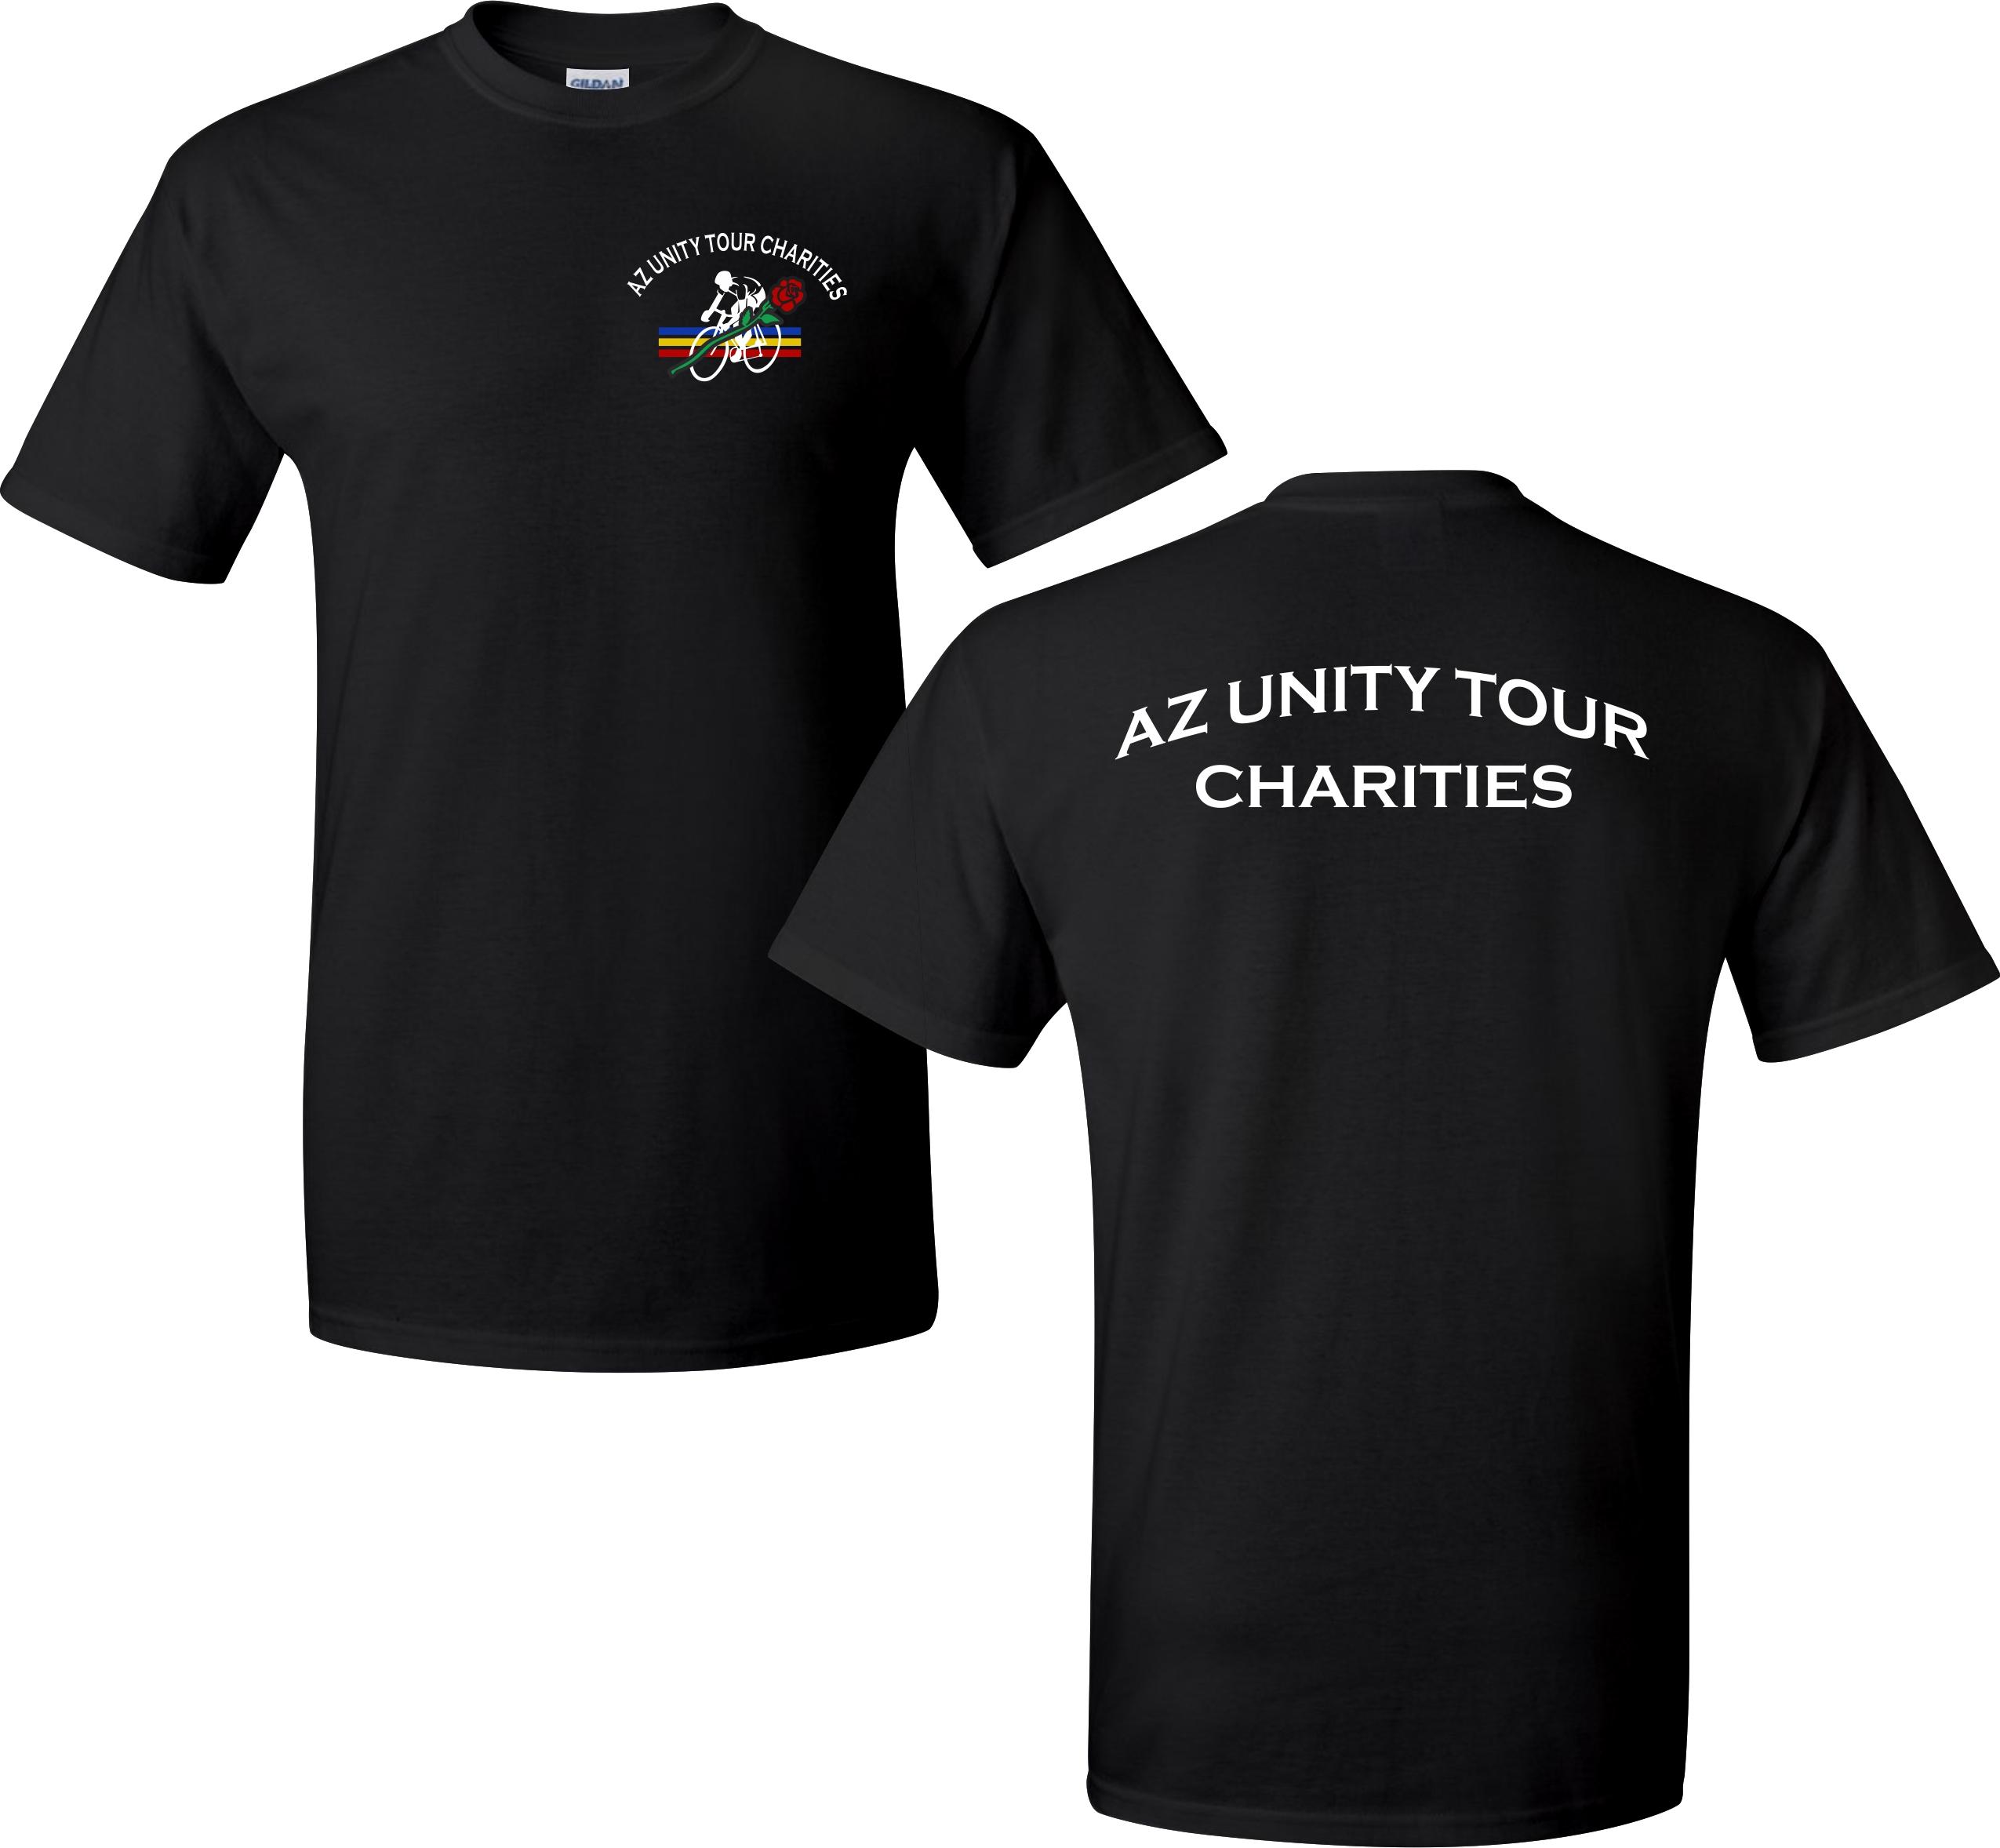 AZ Unity Tour Charities t-shirts